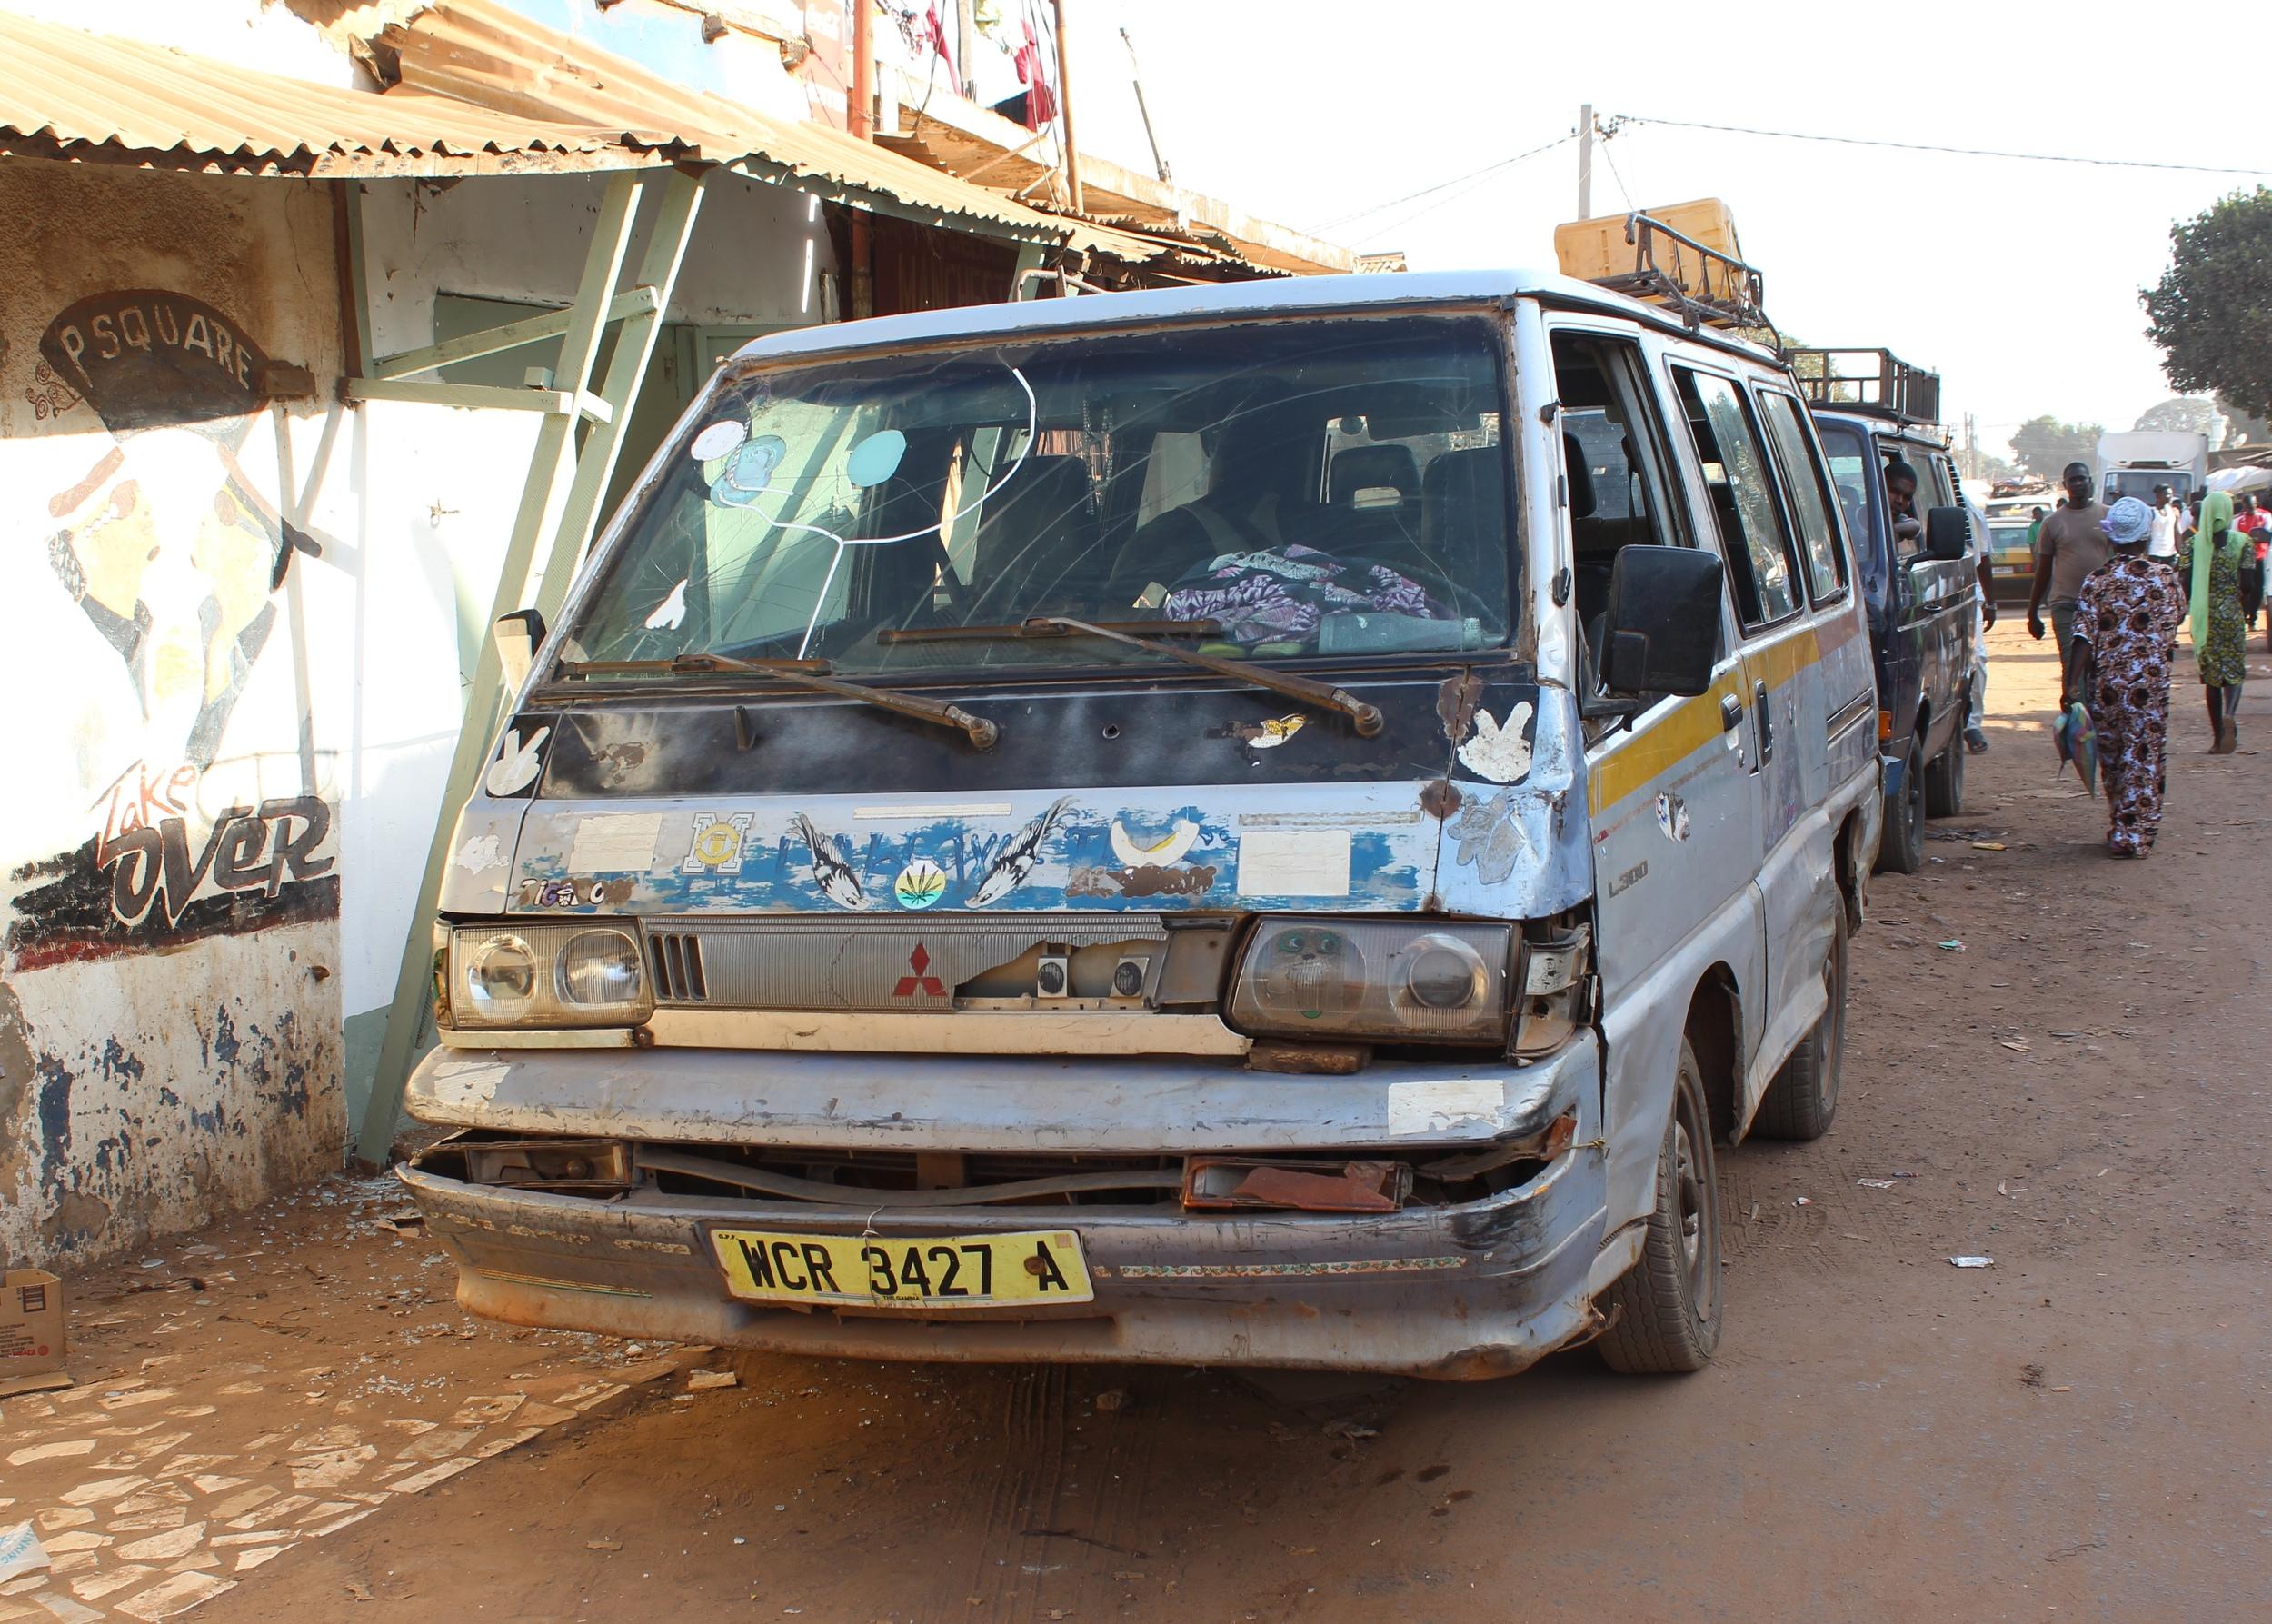 Battered but beautifully decorated passenger van.